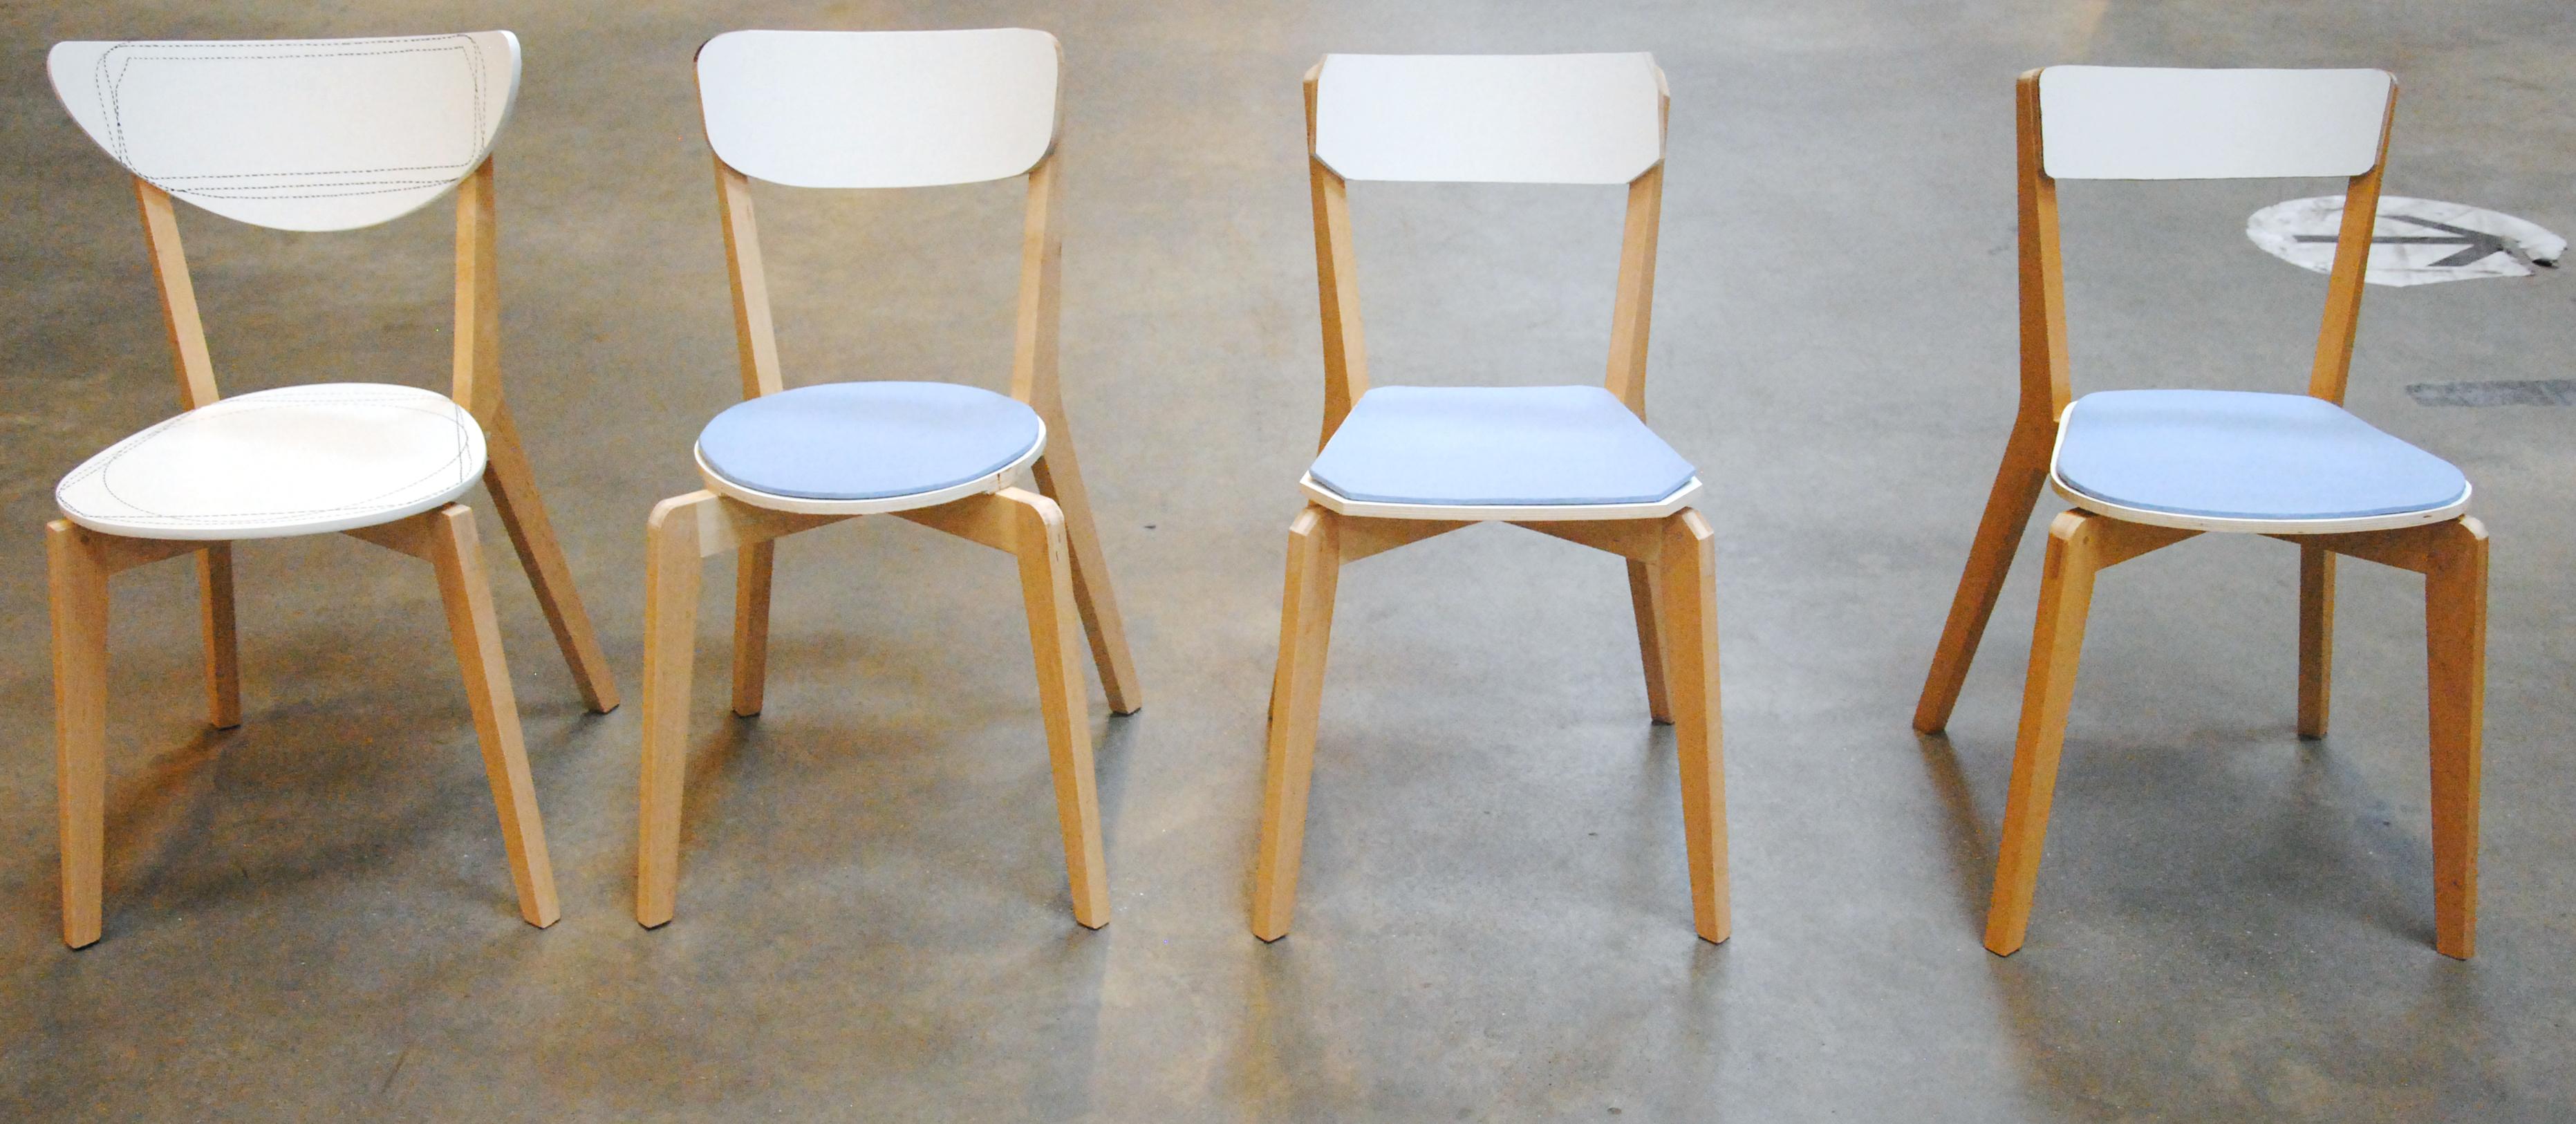 biennale internationale design de saint etienne 2013. Black Bedroom Furniture Sets. Home Design Ideas